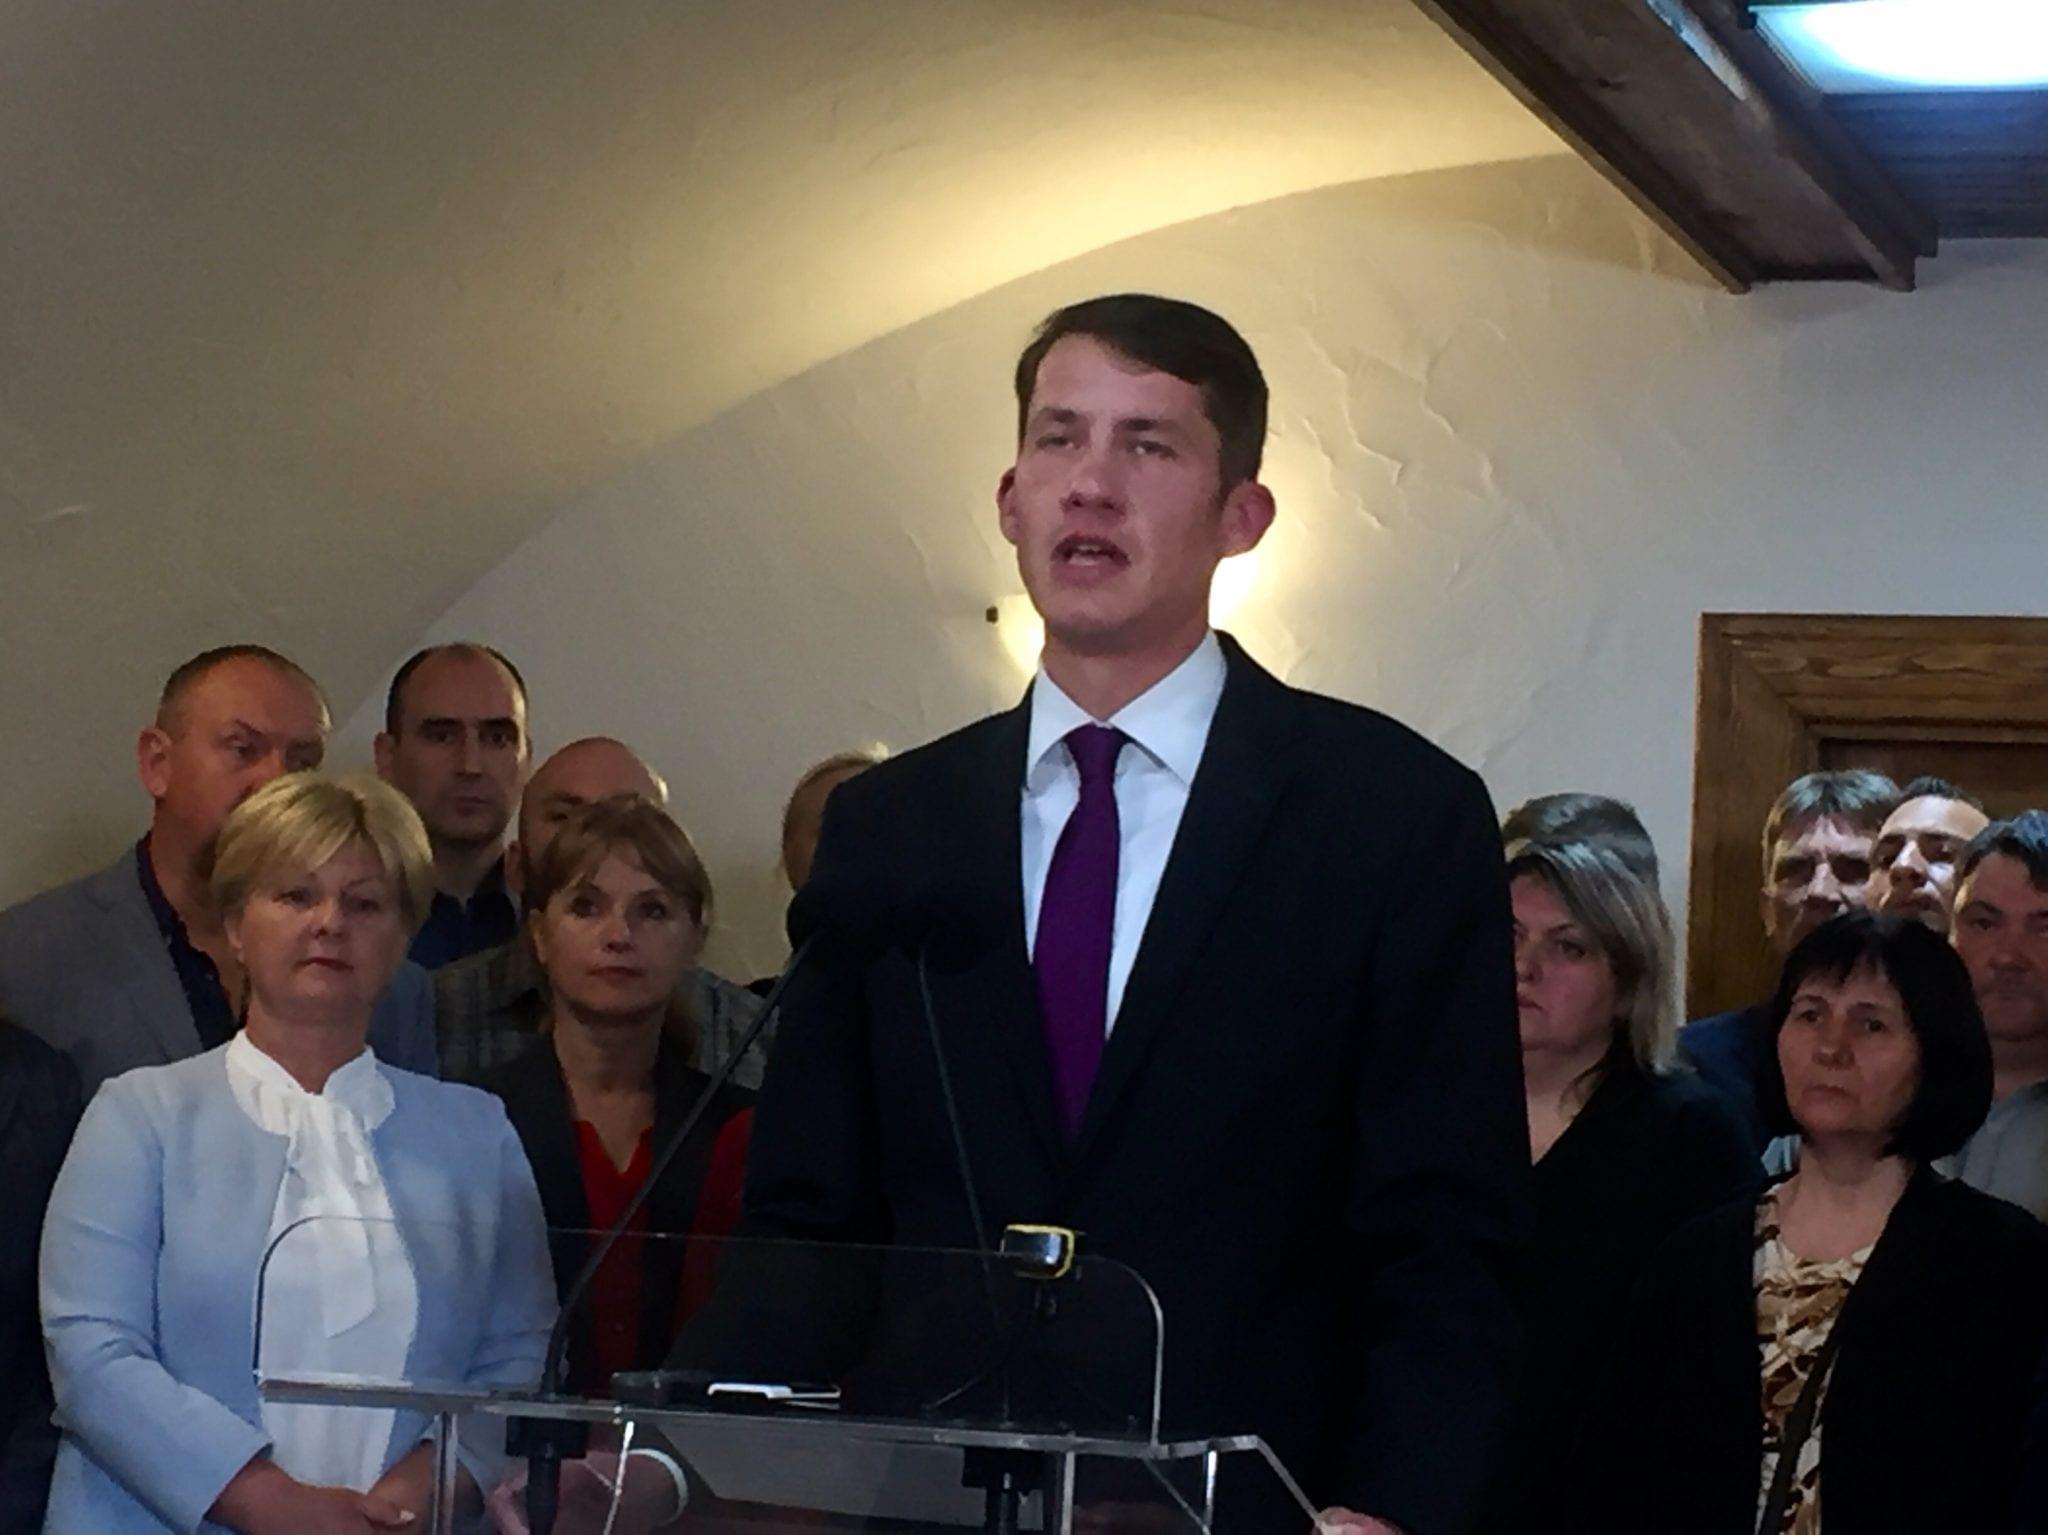 Pastor o podršci birača SVM-u u Vranju: Čudan rezultat parlamentarnih izbora posledica slučajnosti